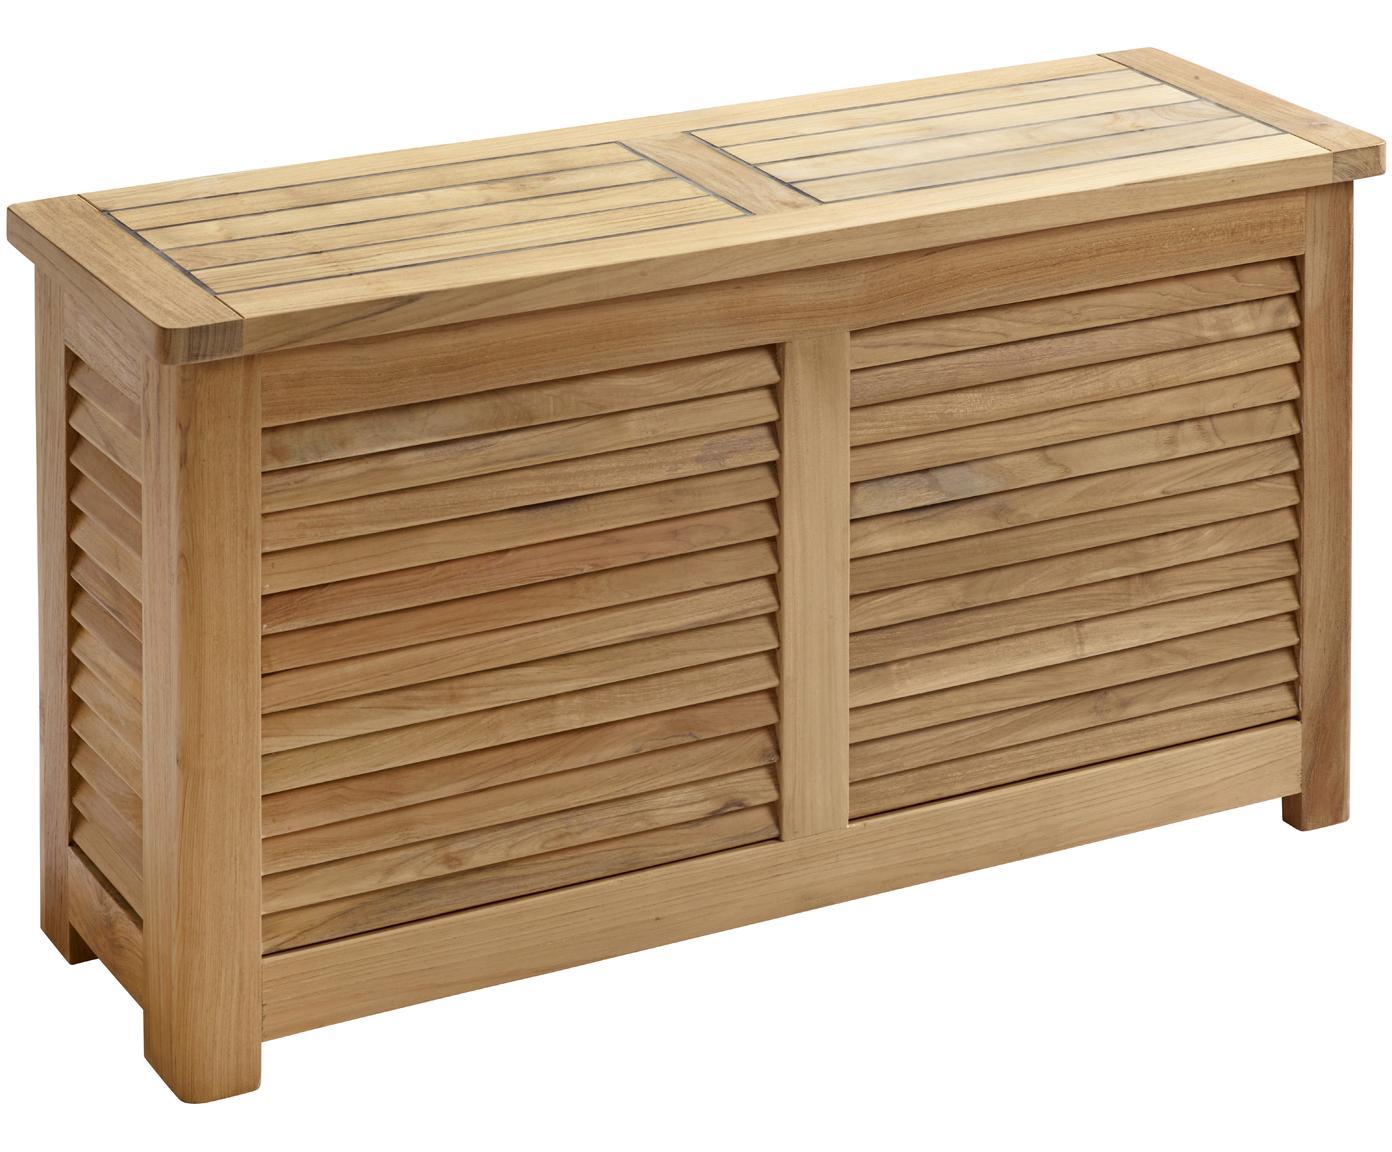 Cassapanca da giardino in legno Storage, Teak, Larg. 90 x Alt. 48 cm